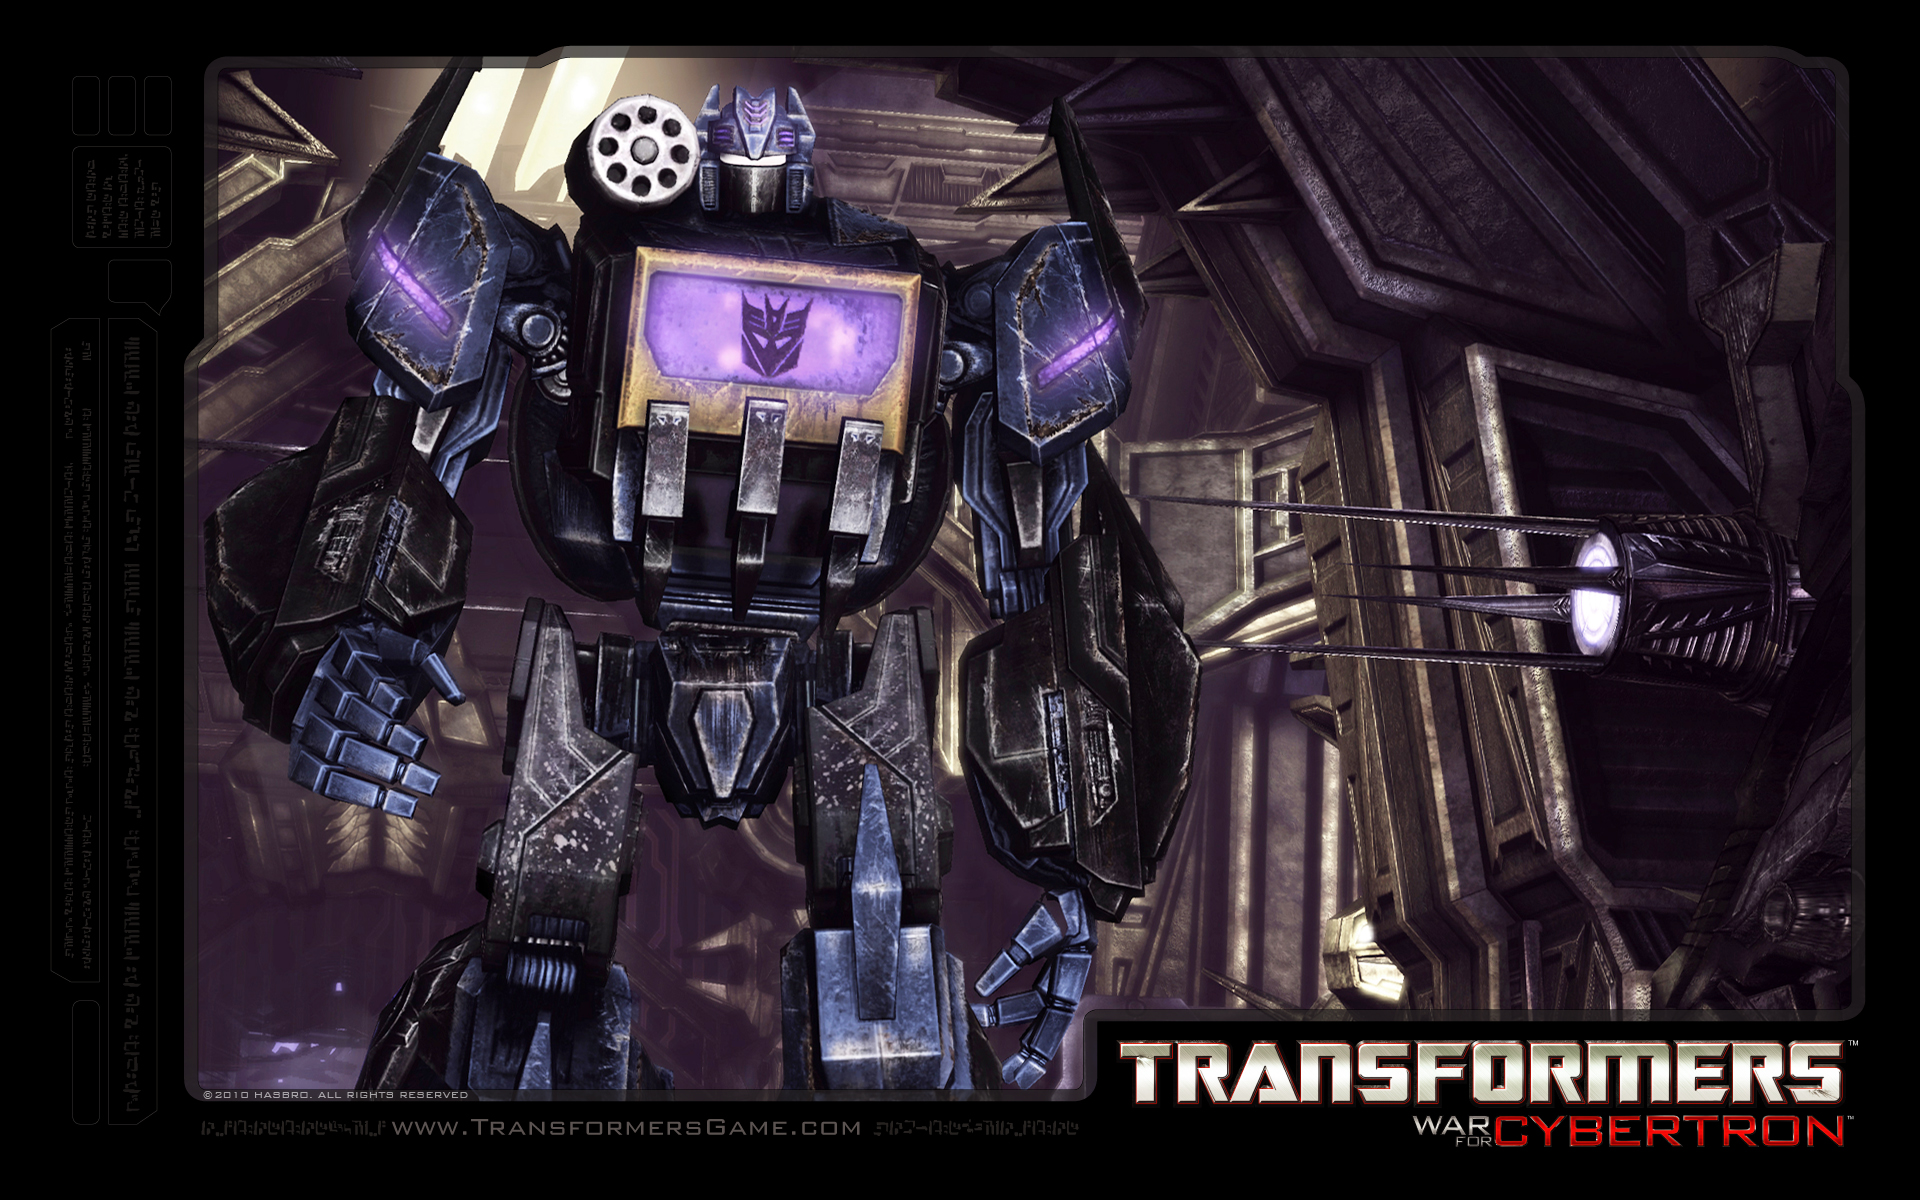 Transformers Fall Of Cybertron 4k Wallpaper Transformers War For Cybertron Wallpaper